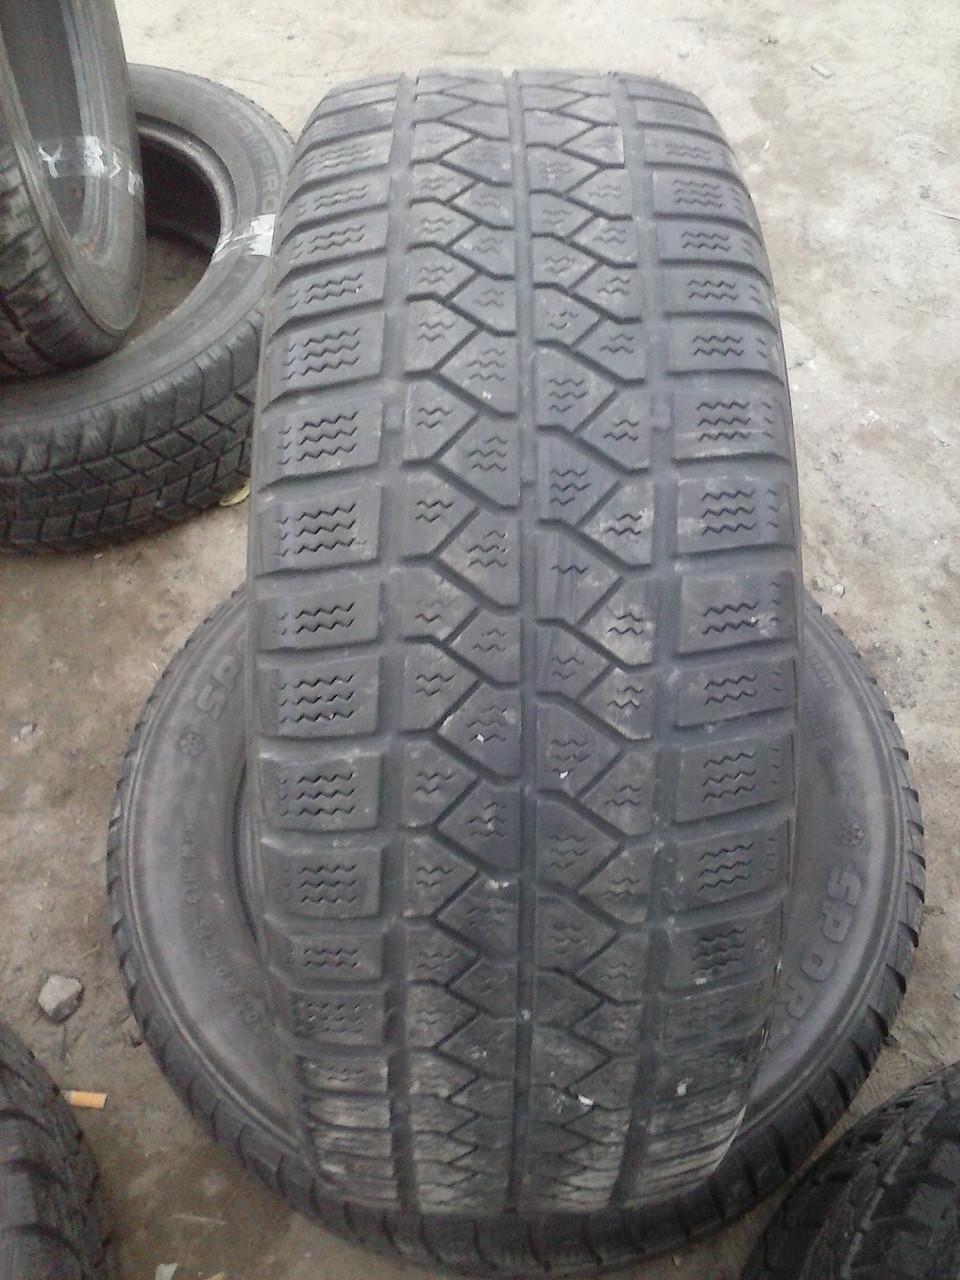 Зимние шины БУ Sportiva WS60 205/60/15 протектор 5мм  2шт